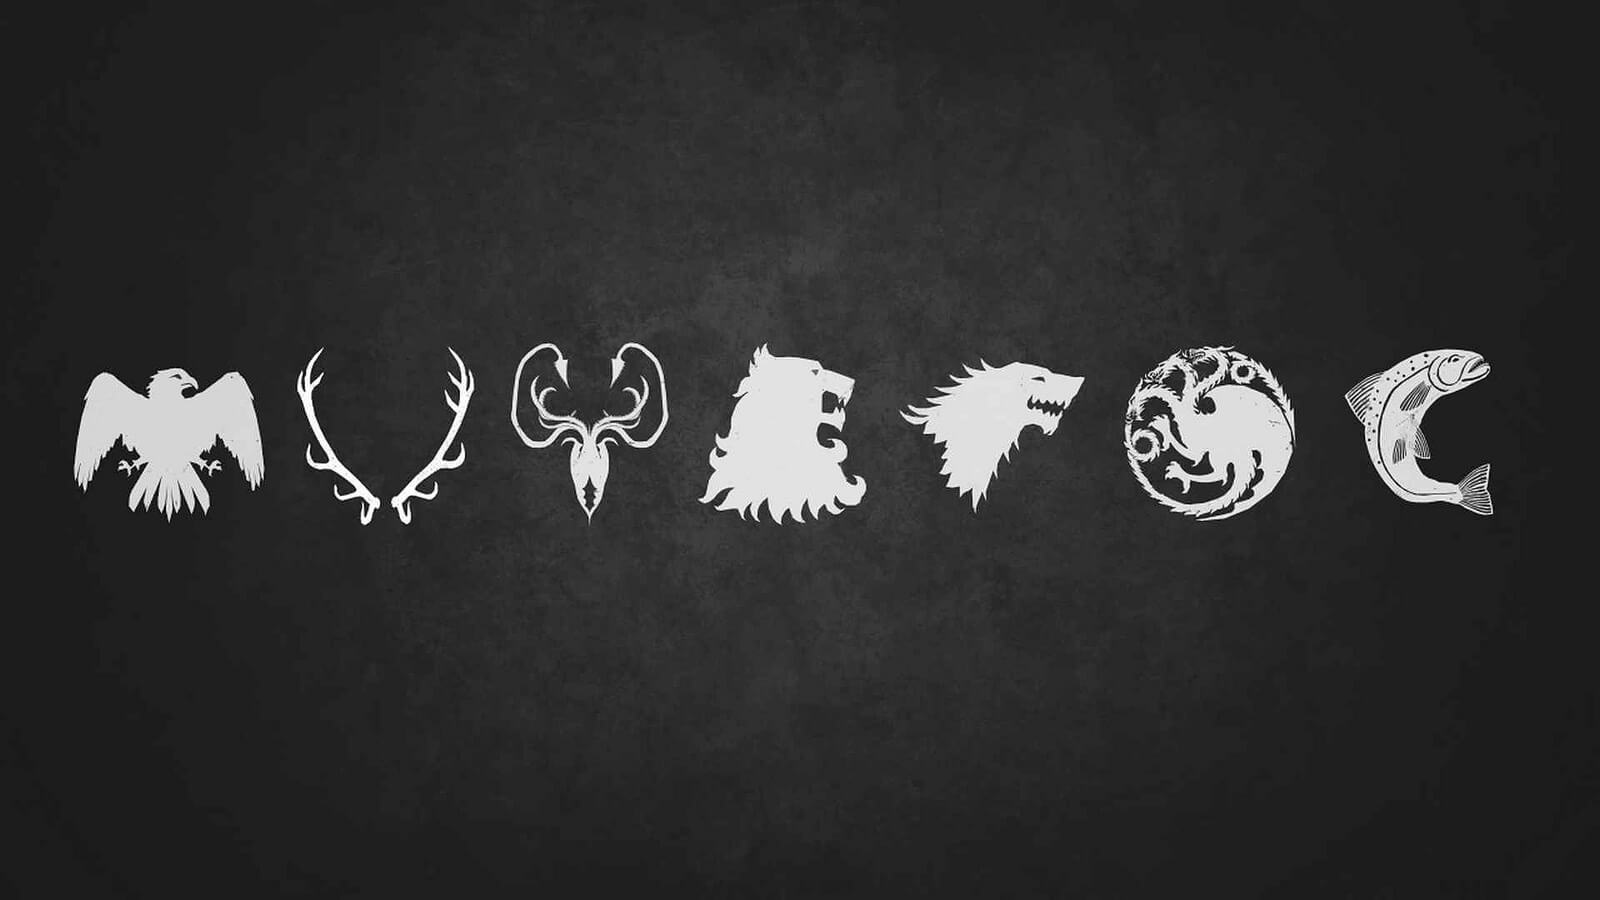 Game of Thrones Season 7 Episode 5